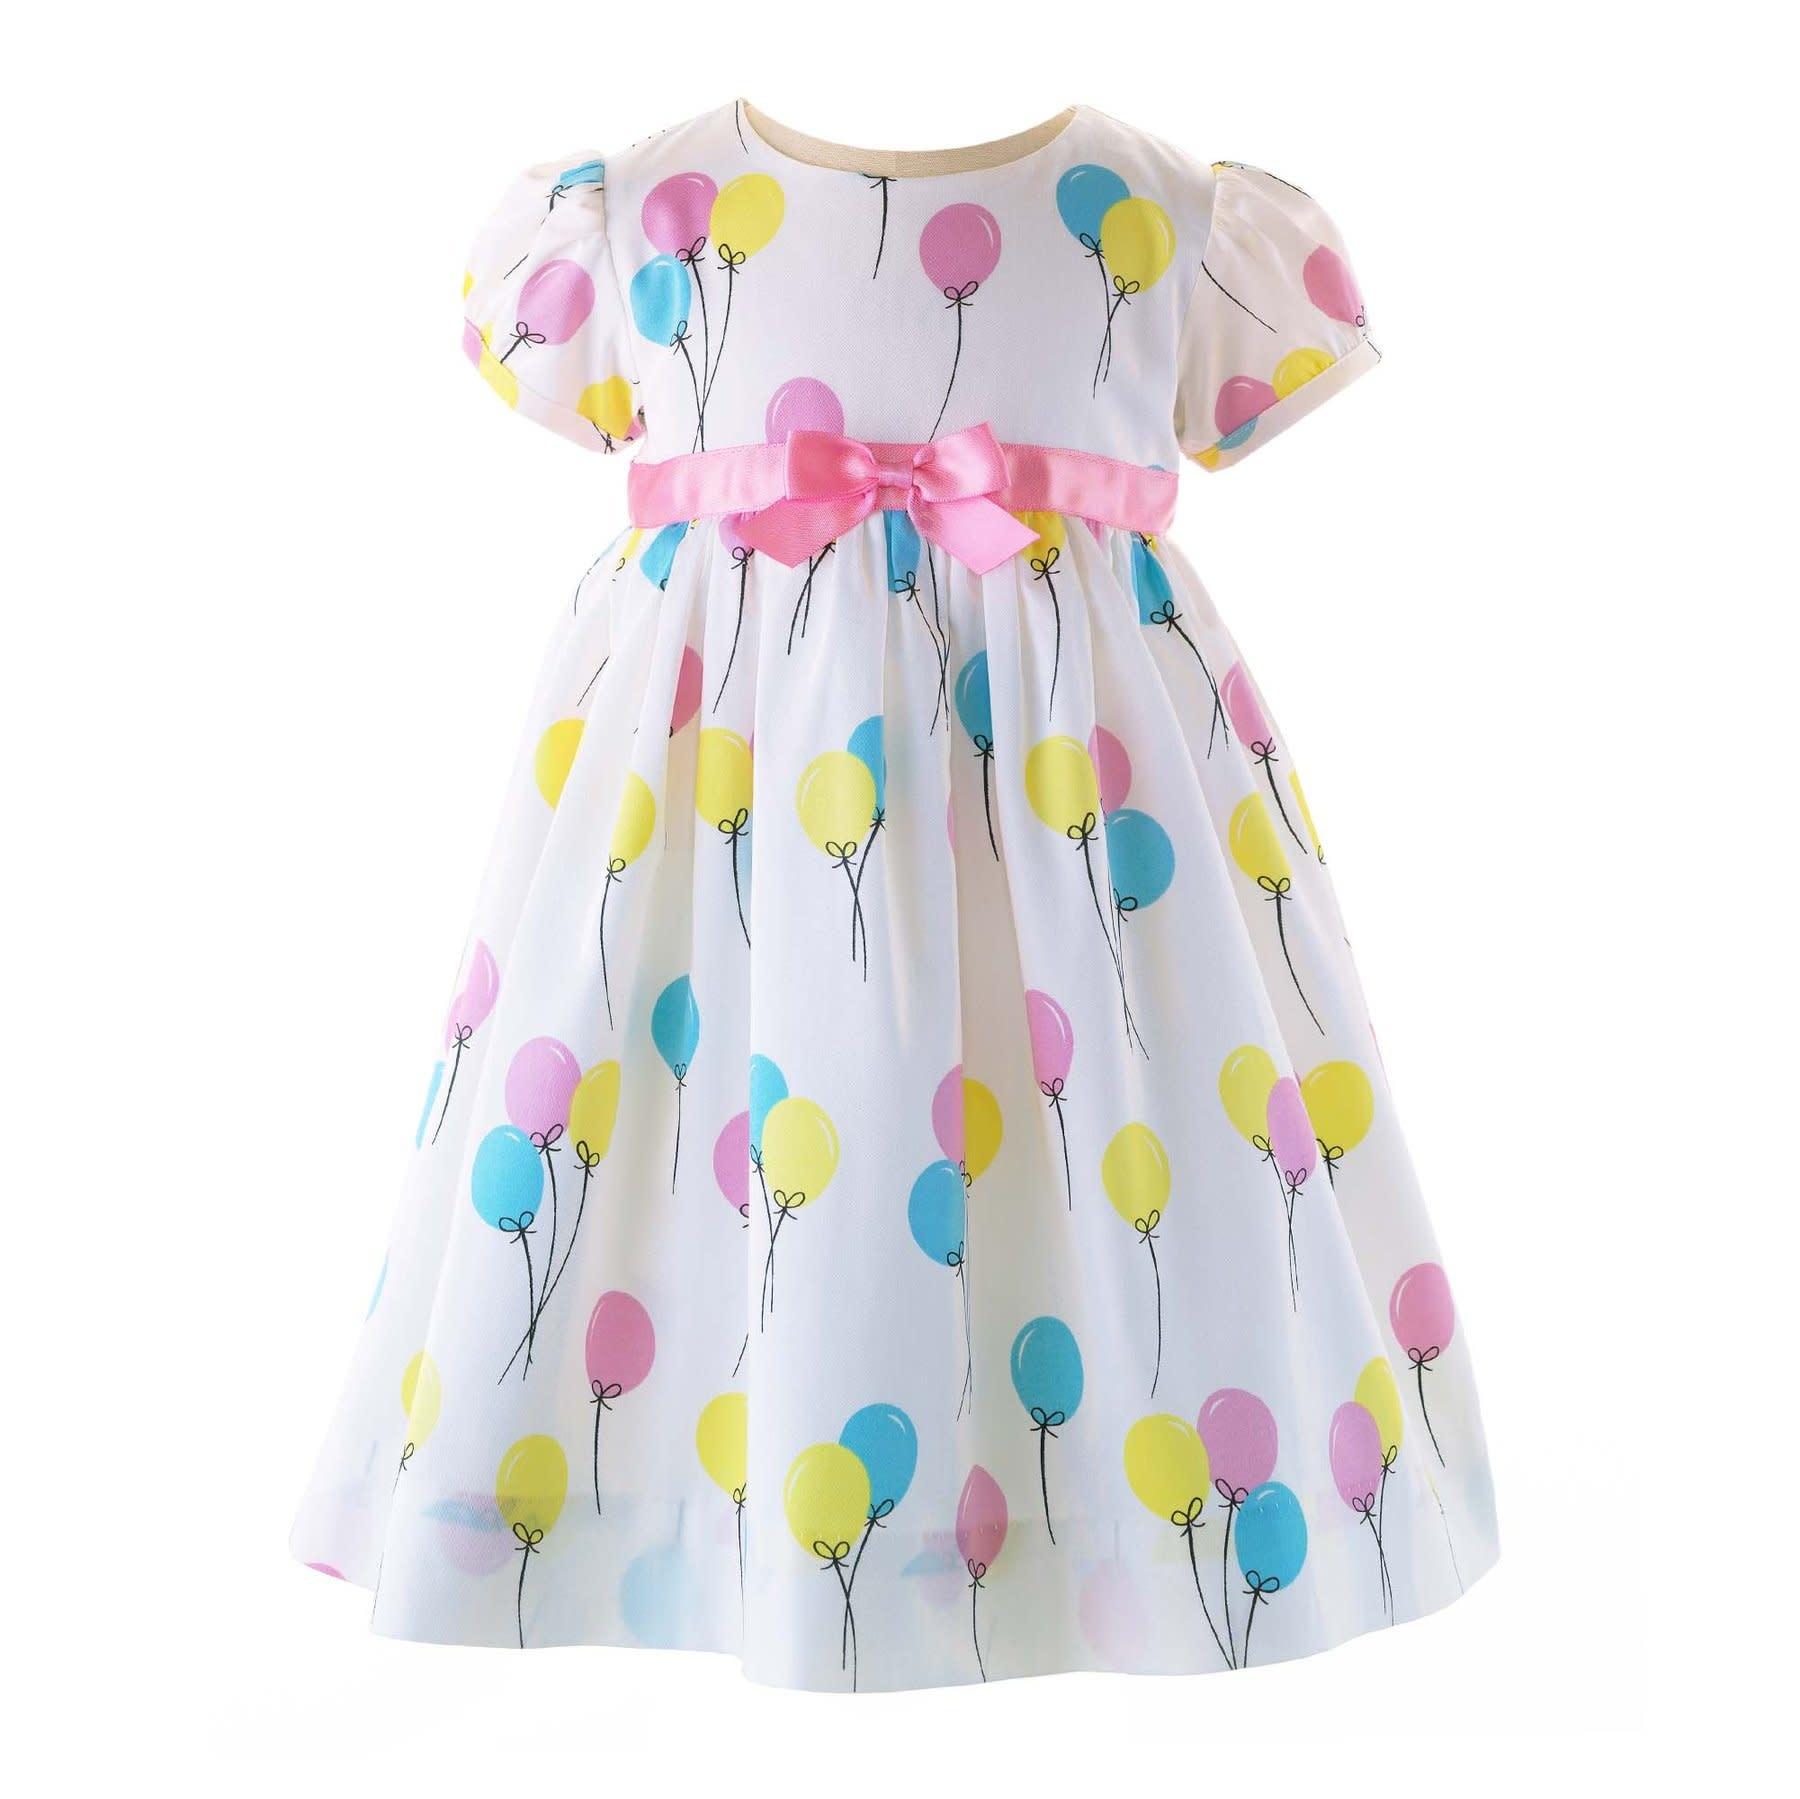 Rachel Riley Balloon Dress